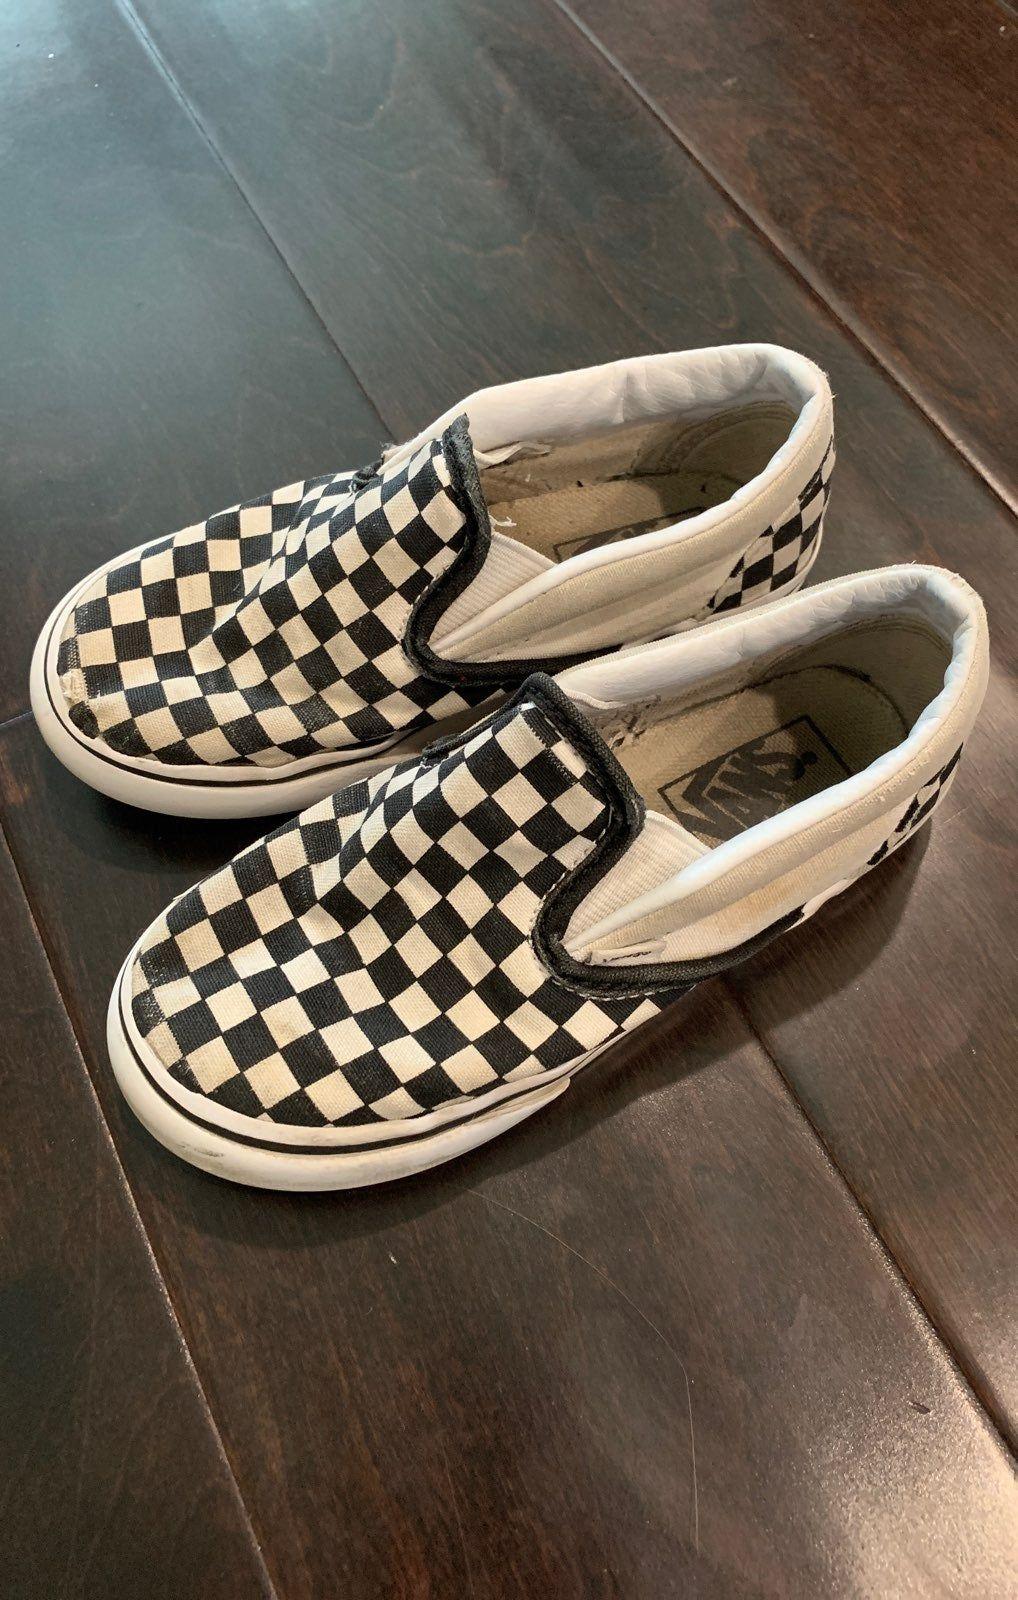 Used checkered vans Size 9.5 k   Vans